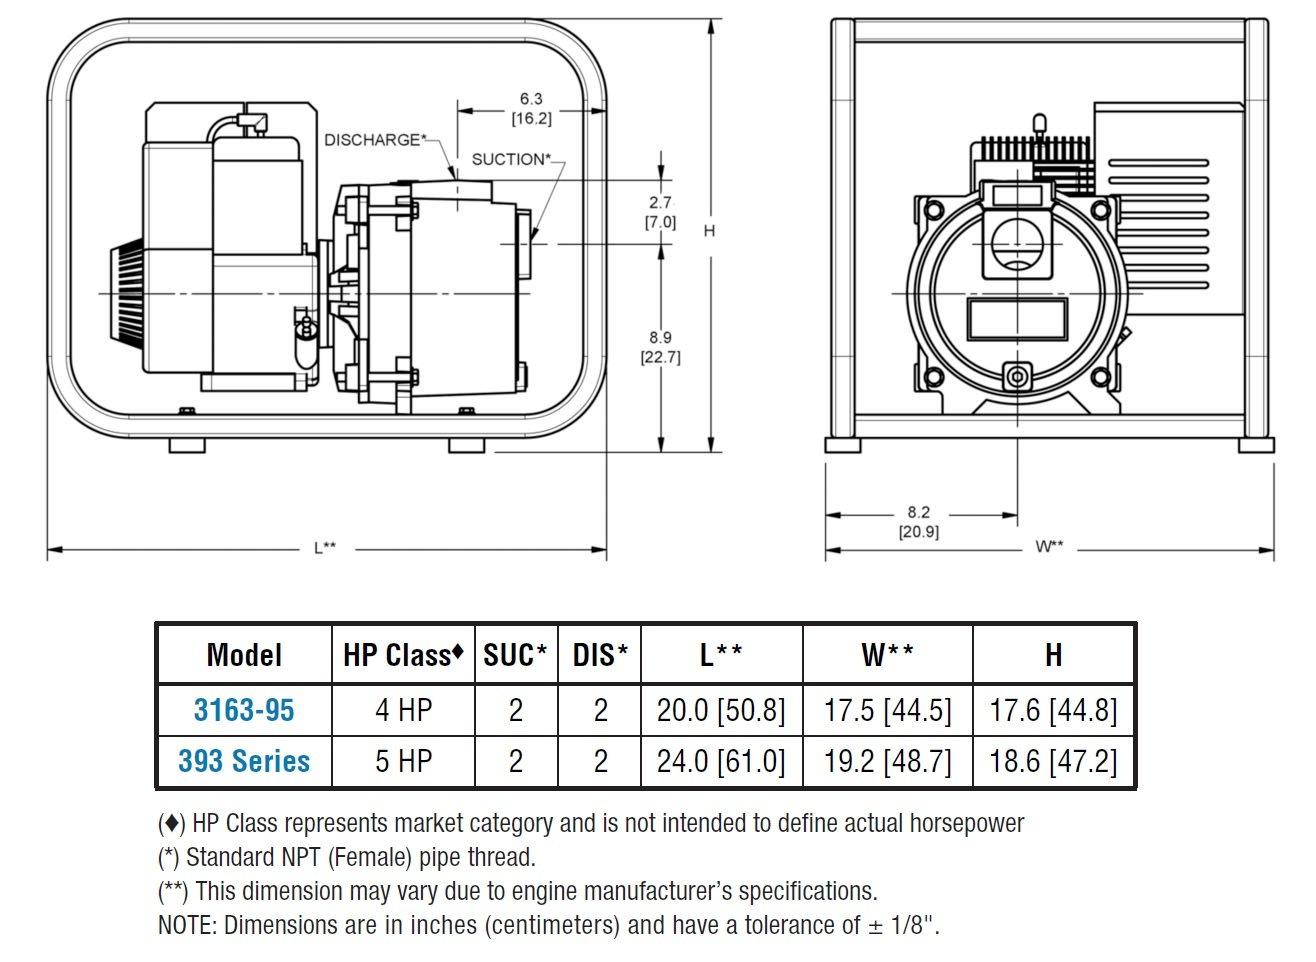 Amt 3930 D5 2 Npt Trash Pump 5hp Hatz Diesel 1b20 Engine 185gpm Diagram 46psi Viton Sic Seal Industrial Scientific